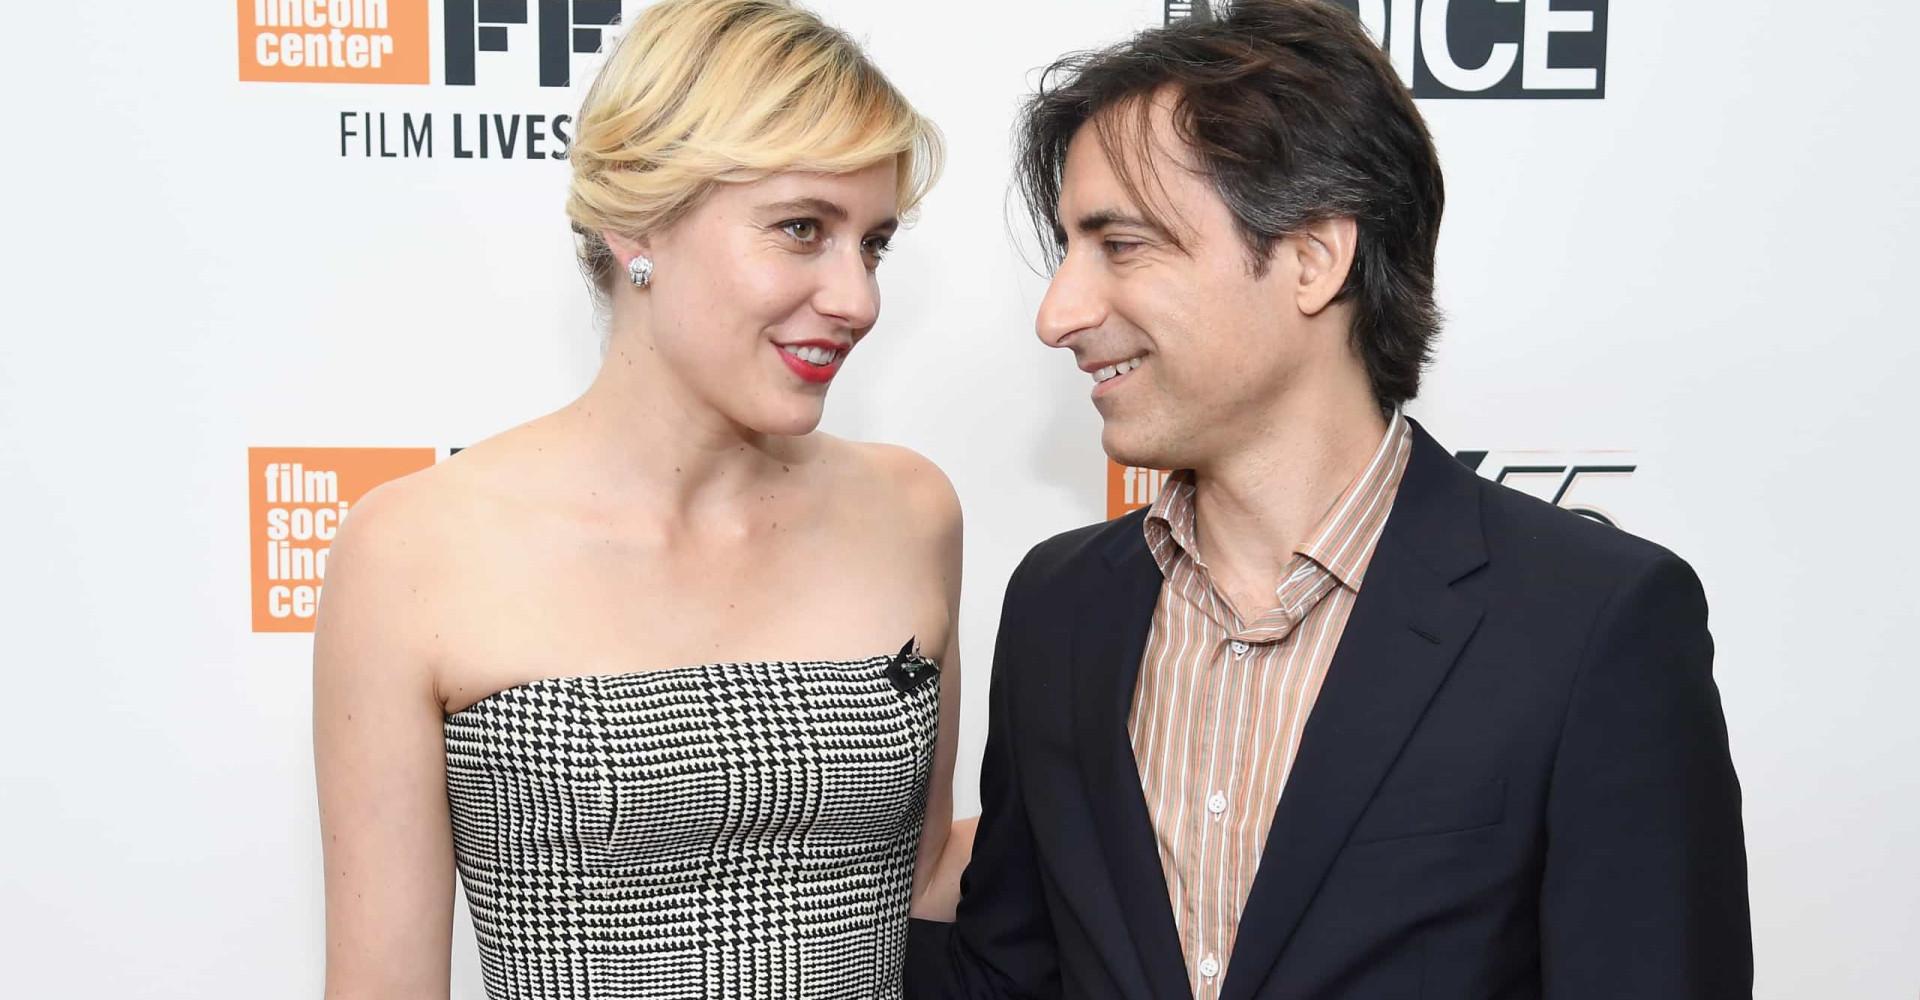 Hollywood's untold love story: Greta Gerwig and Noah Baumbach